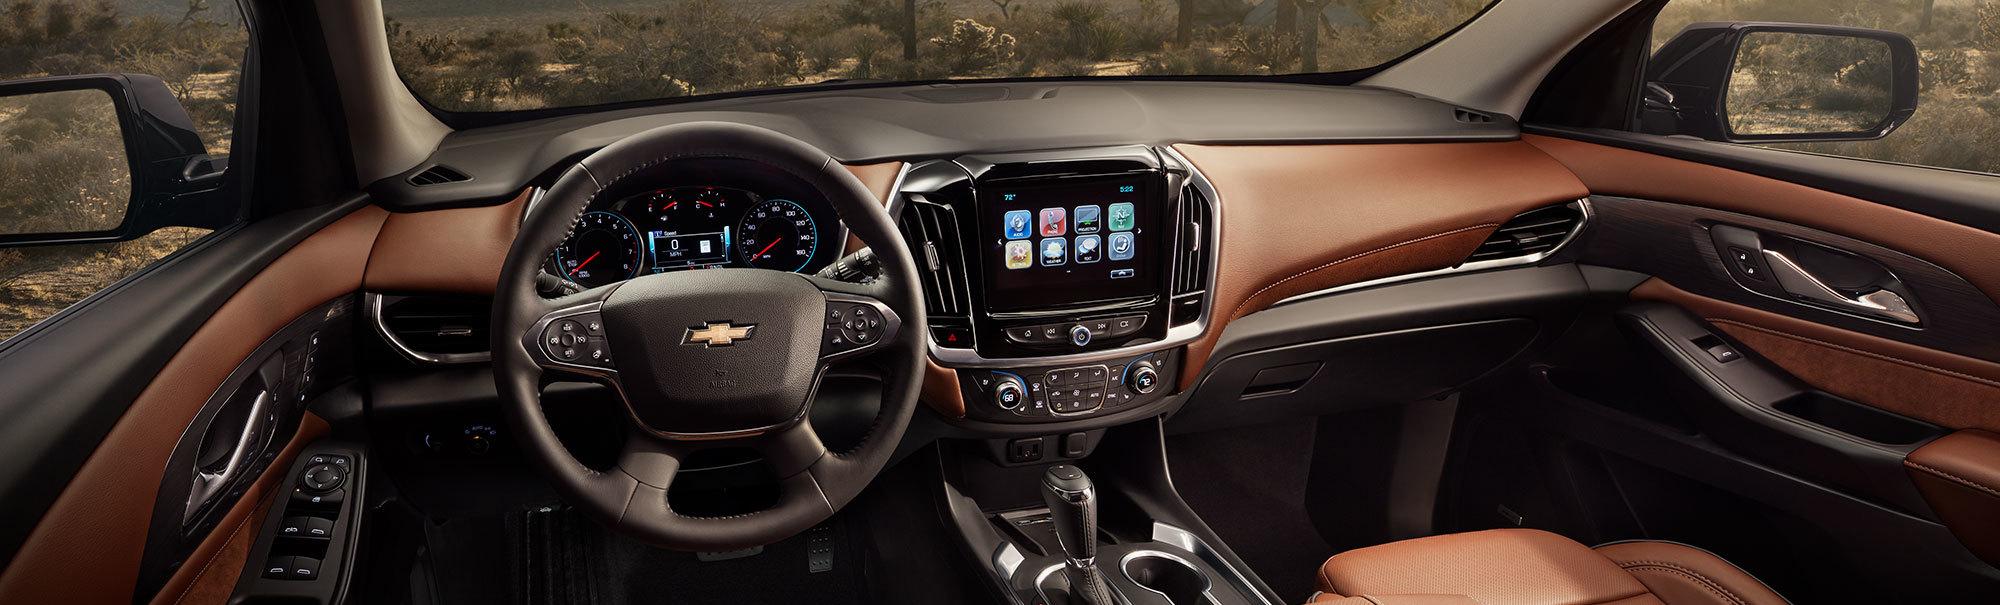 2020 Chevrolet Traverse Dashboard